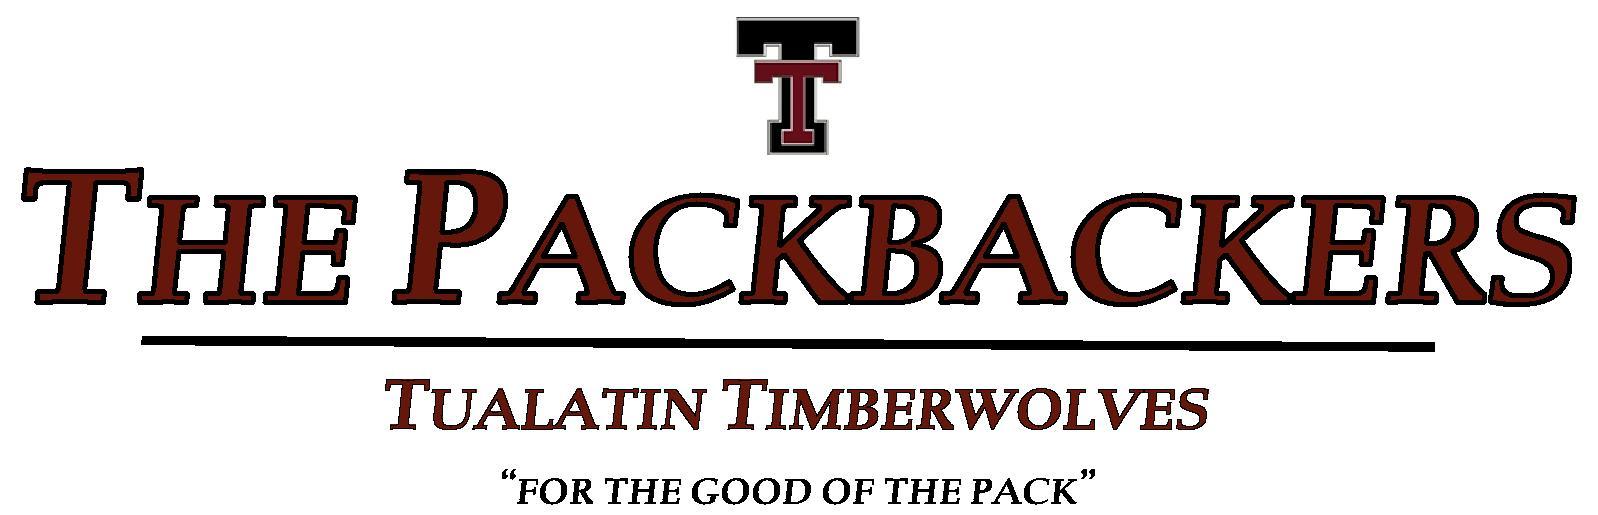 Packbackers